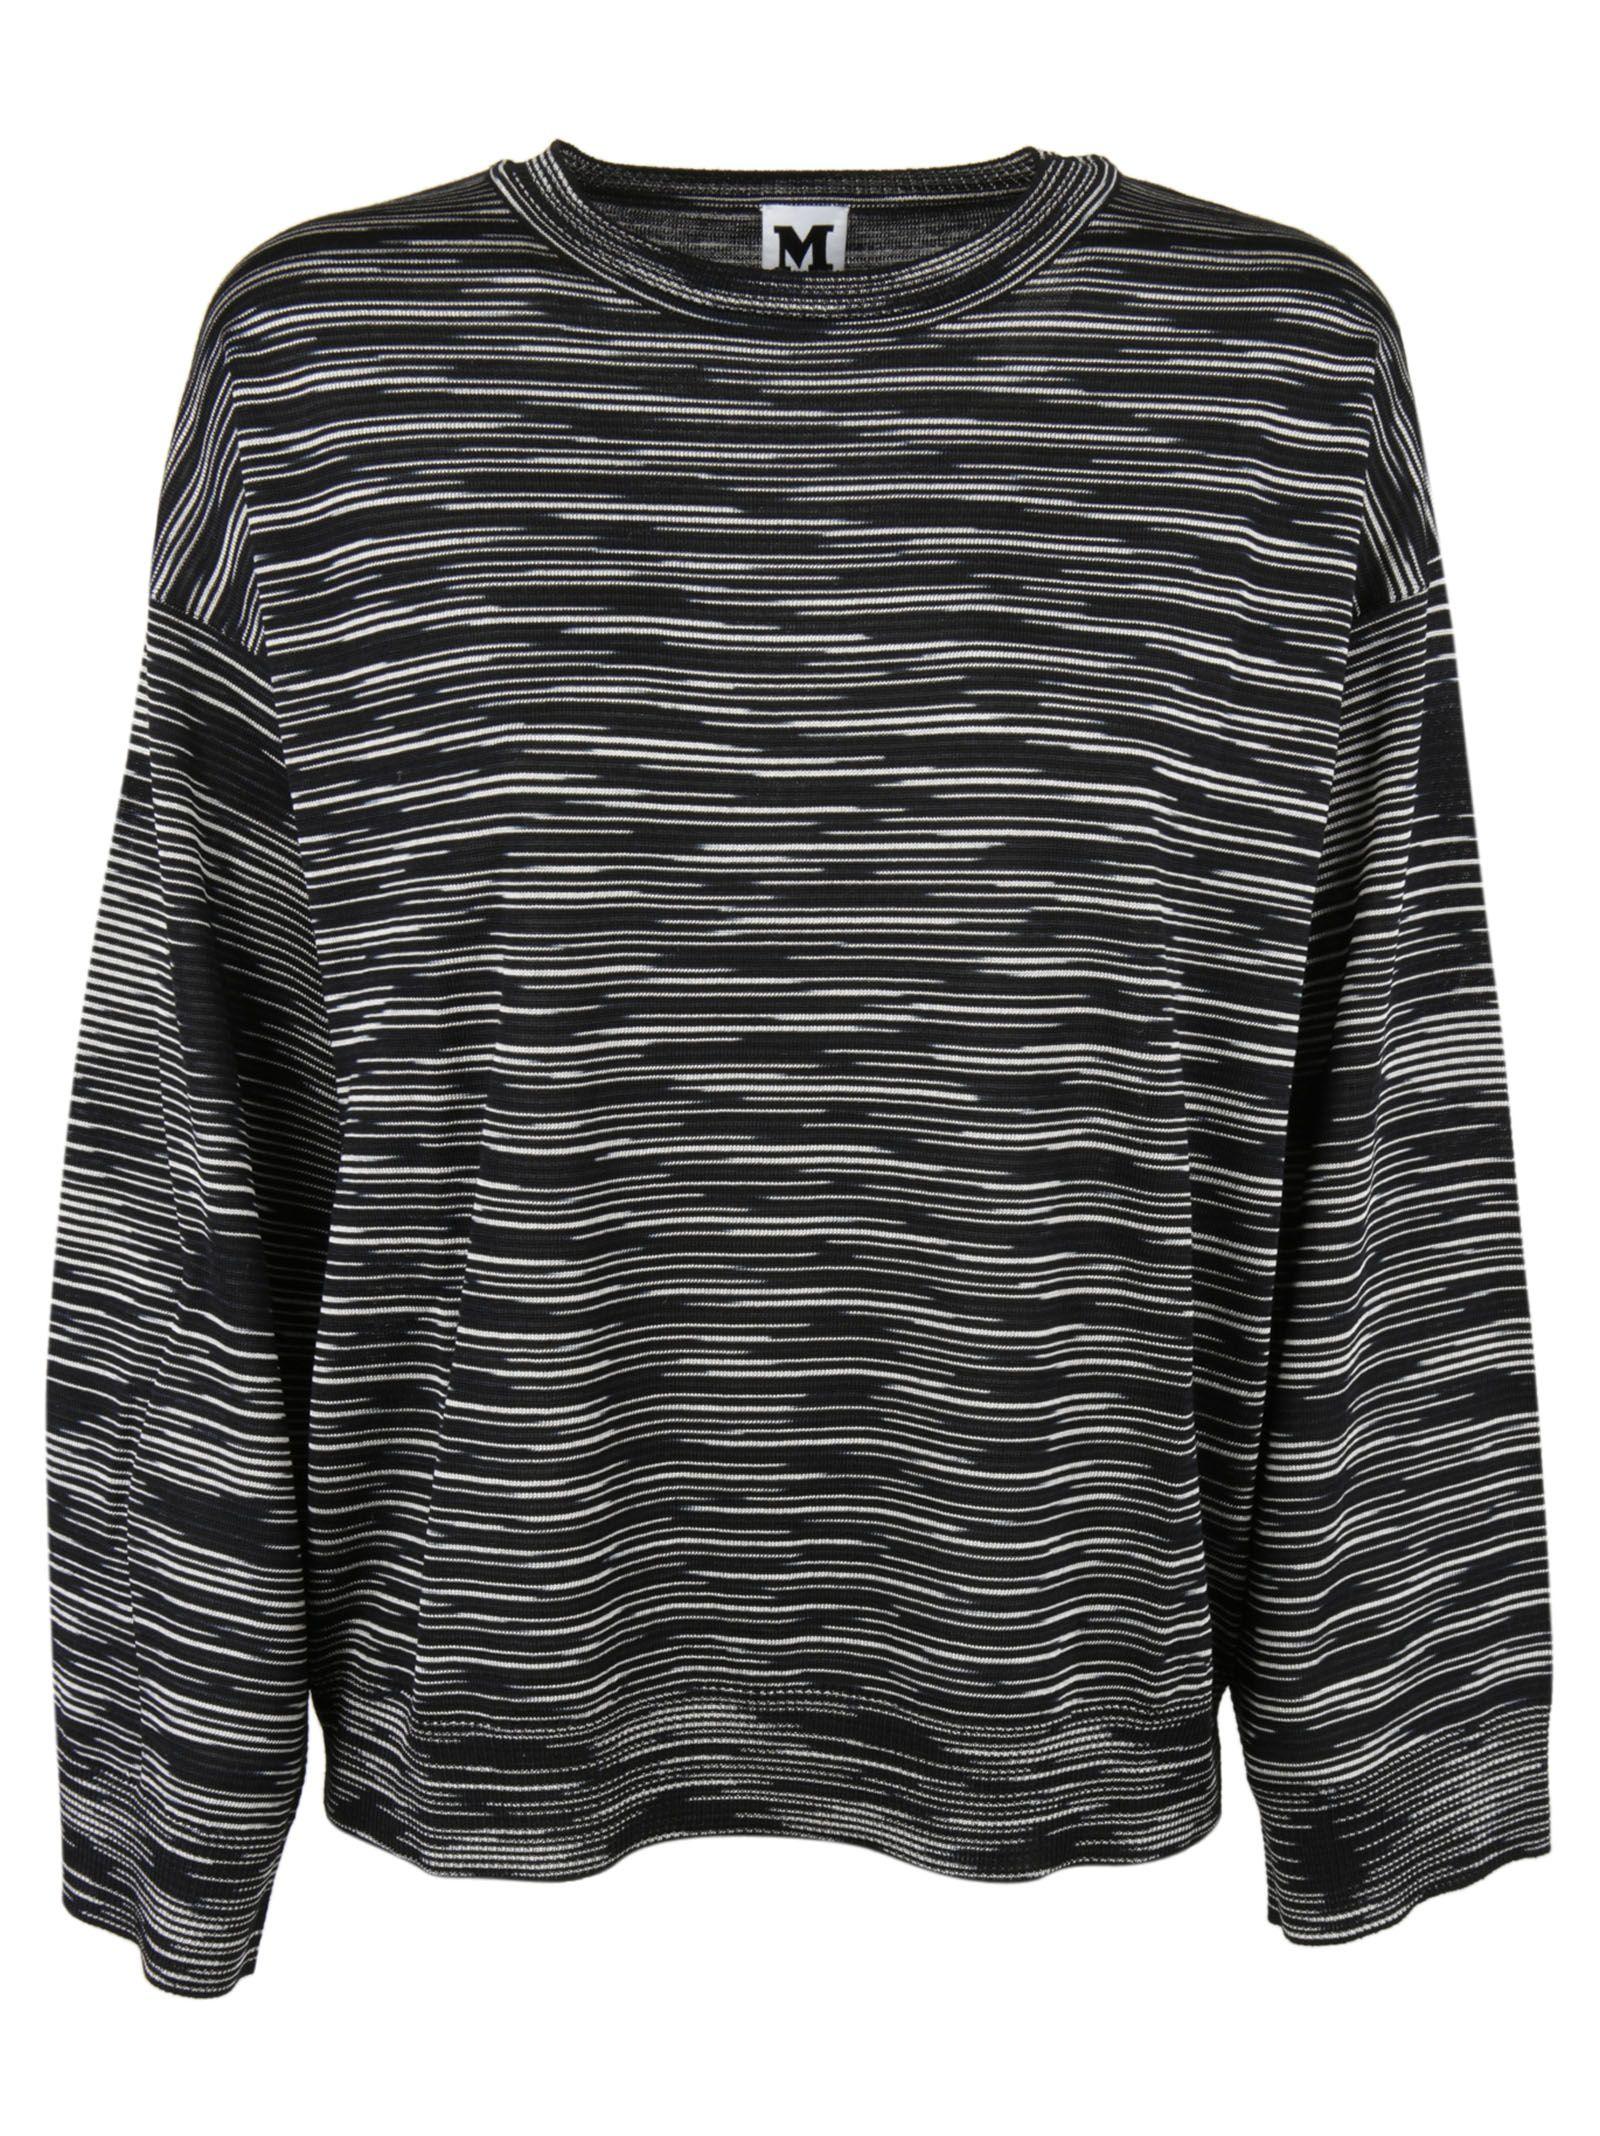 Missoni - Missoni Round Neck Sweater - Black/White, Women's ...